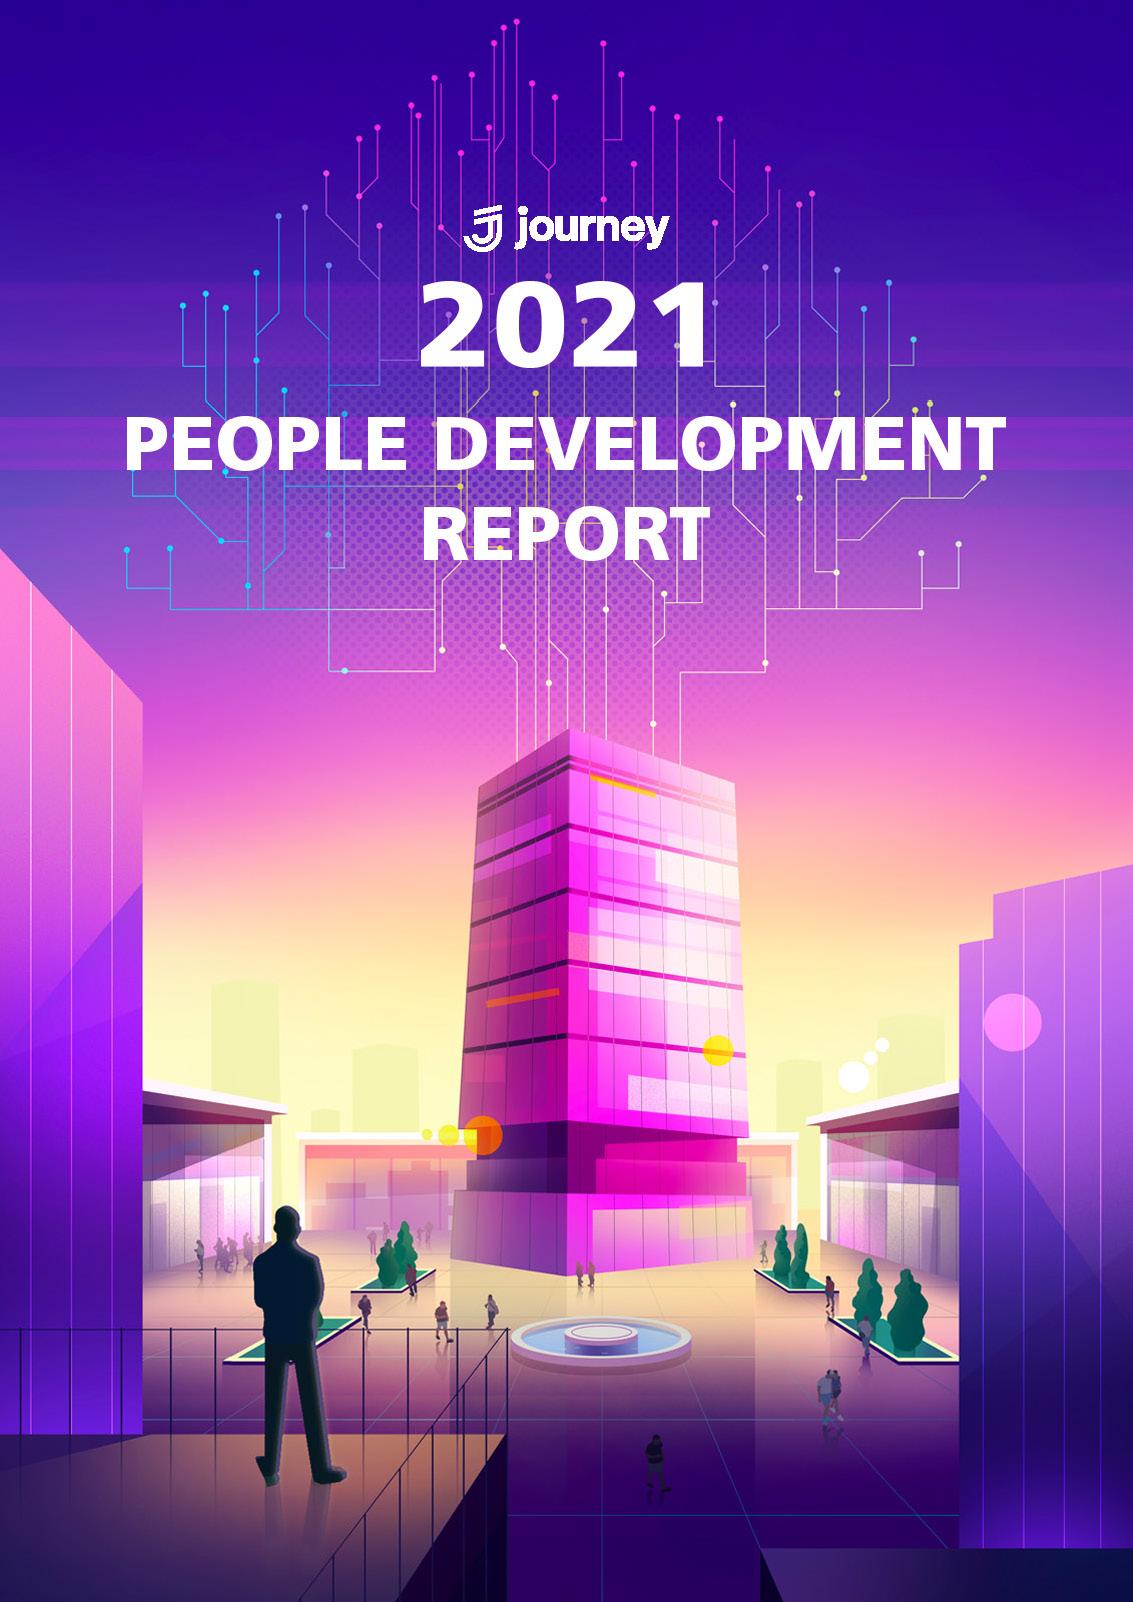 People Development Report 2021